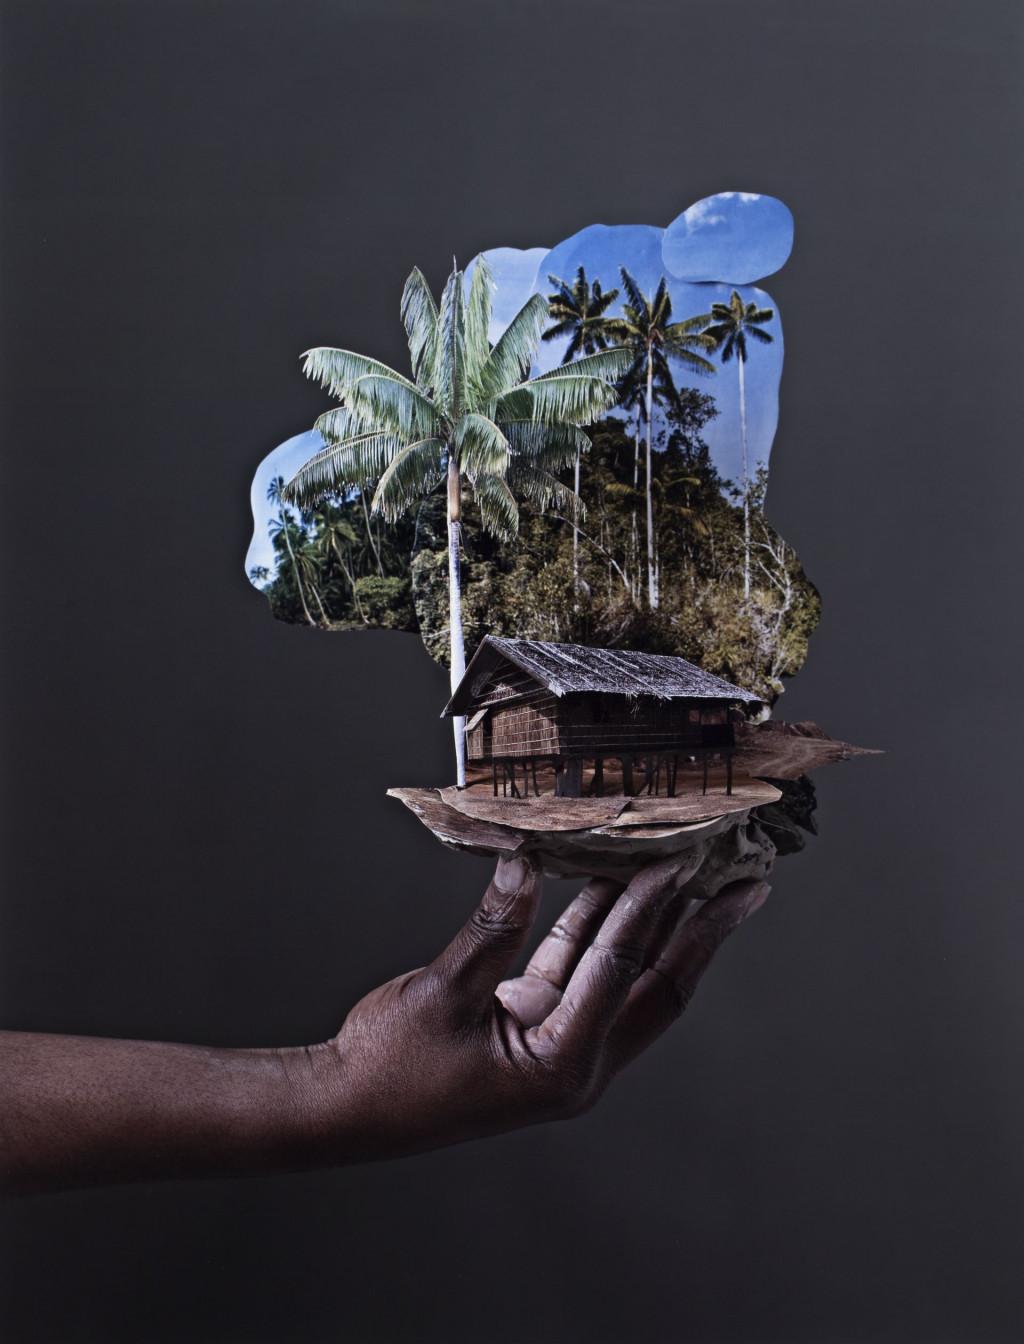 Otobong Nkanga, 'Shaping Memory', 2021. Collection Stedelijk Museum Amsterdam